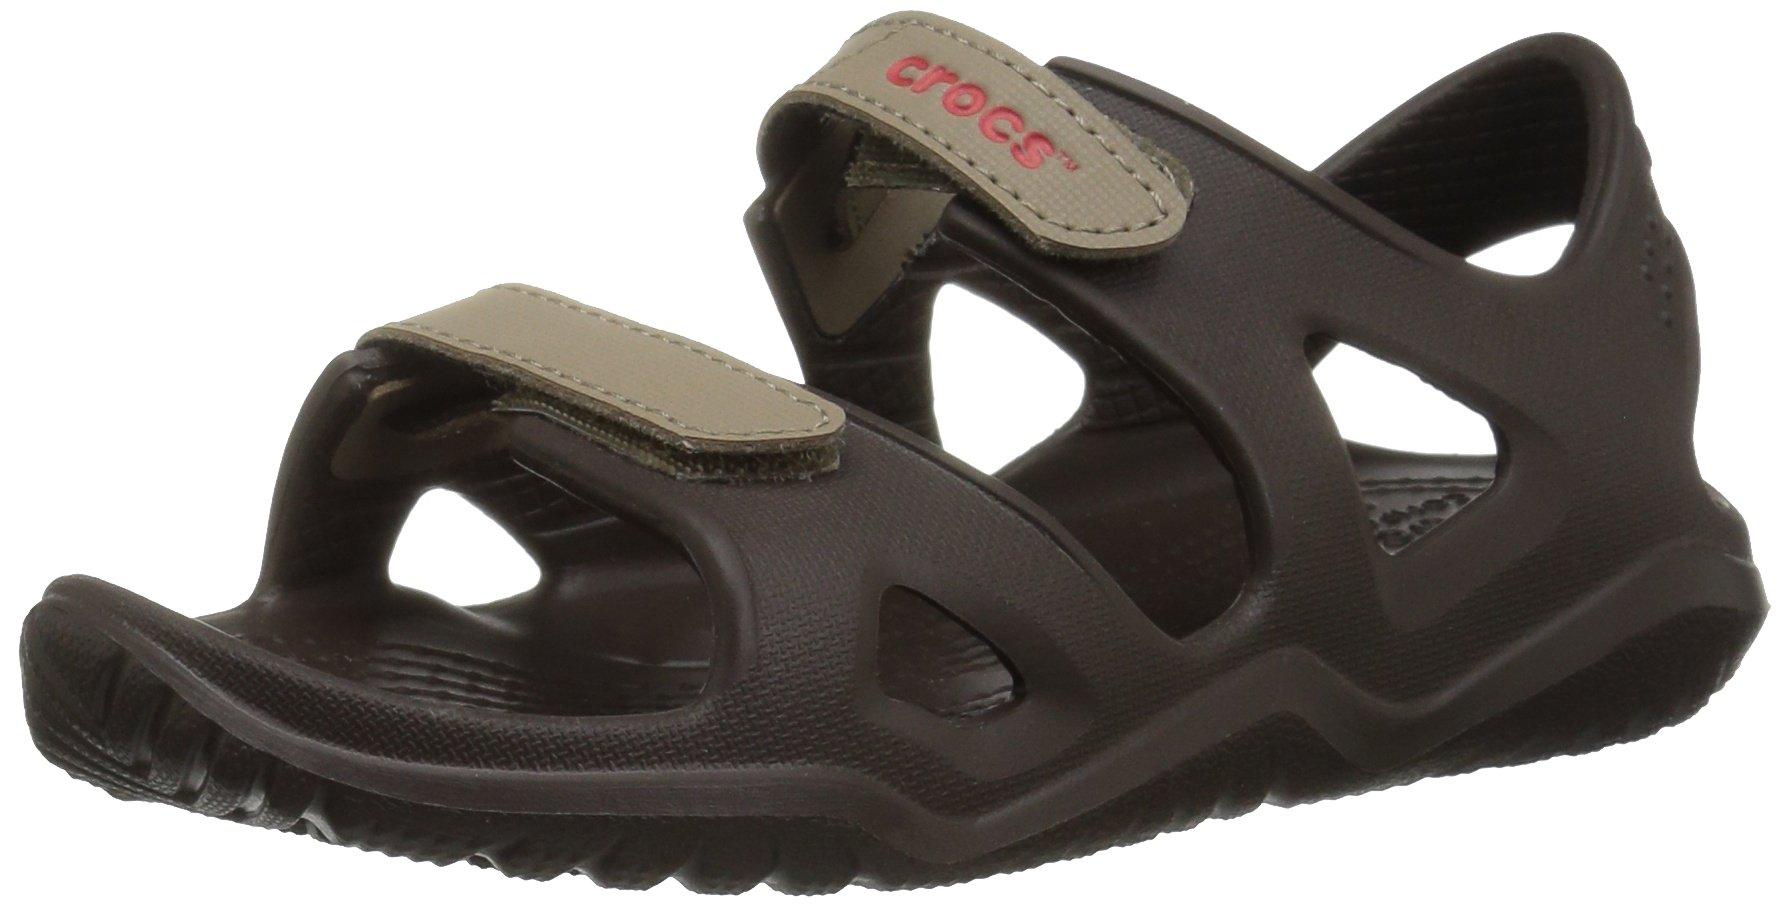 Crocs unisex-kids Swiftwater River Sandal Sandal, espresso/khaki, 9 M US Toddler by Crocs